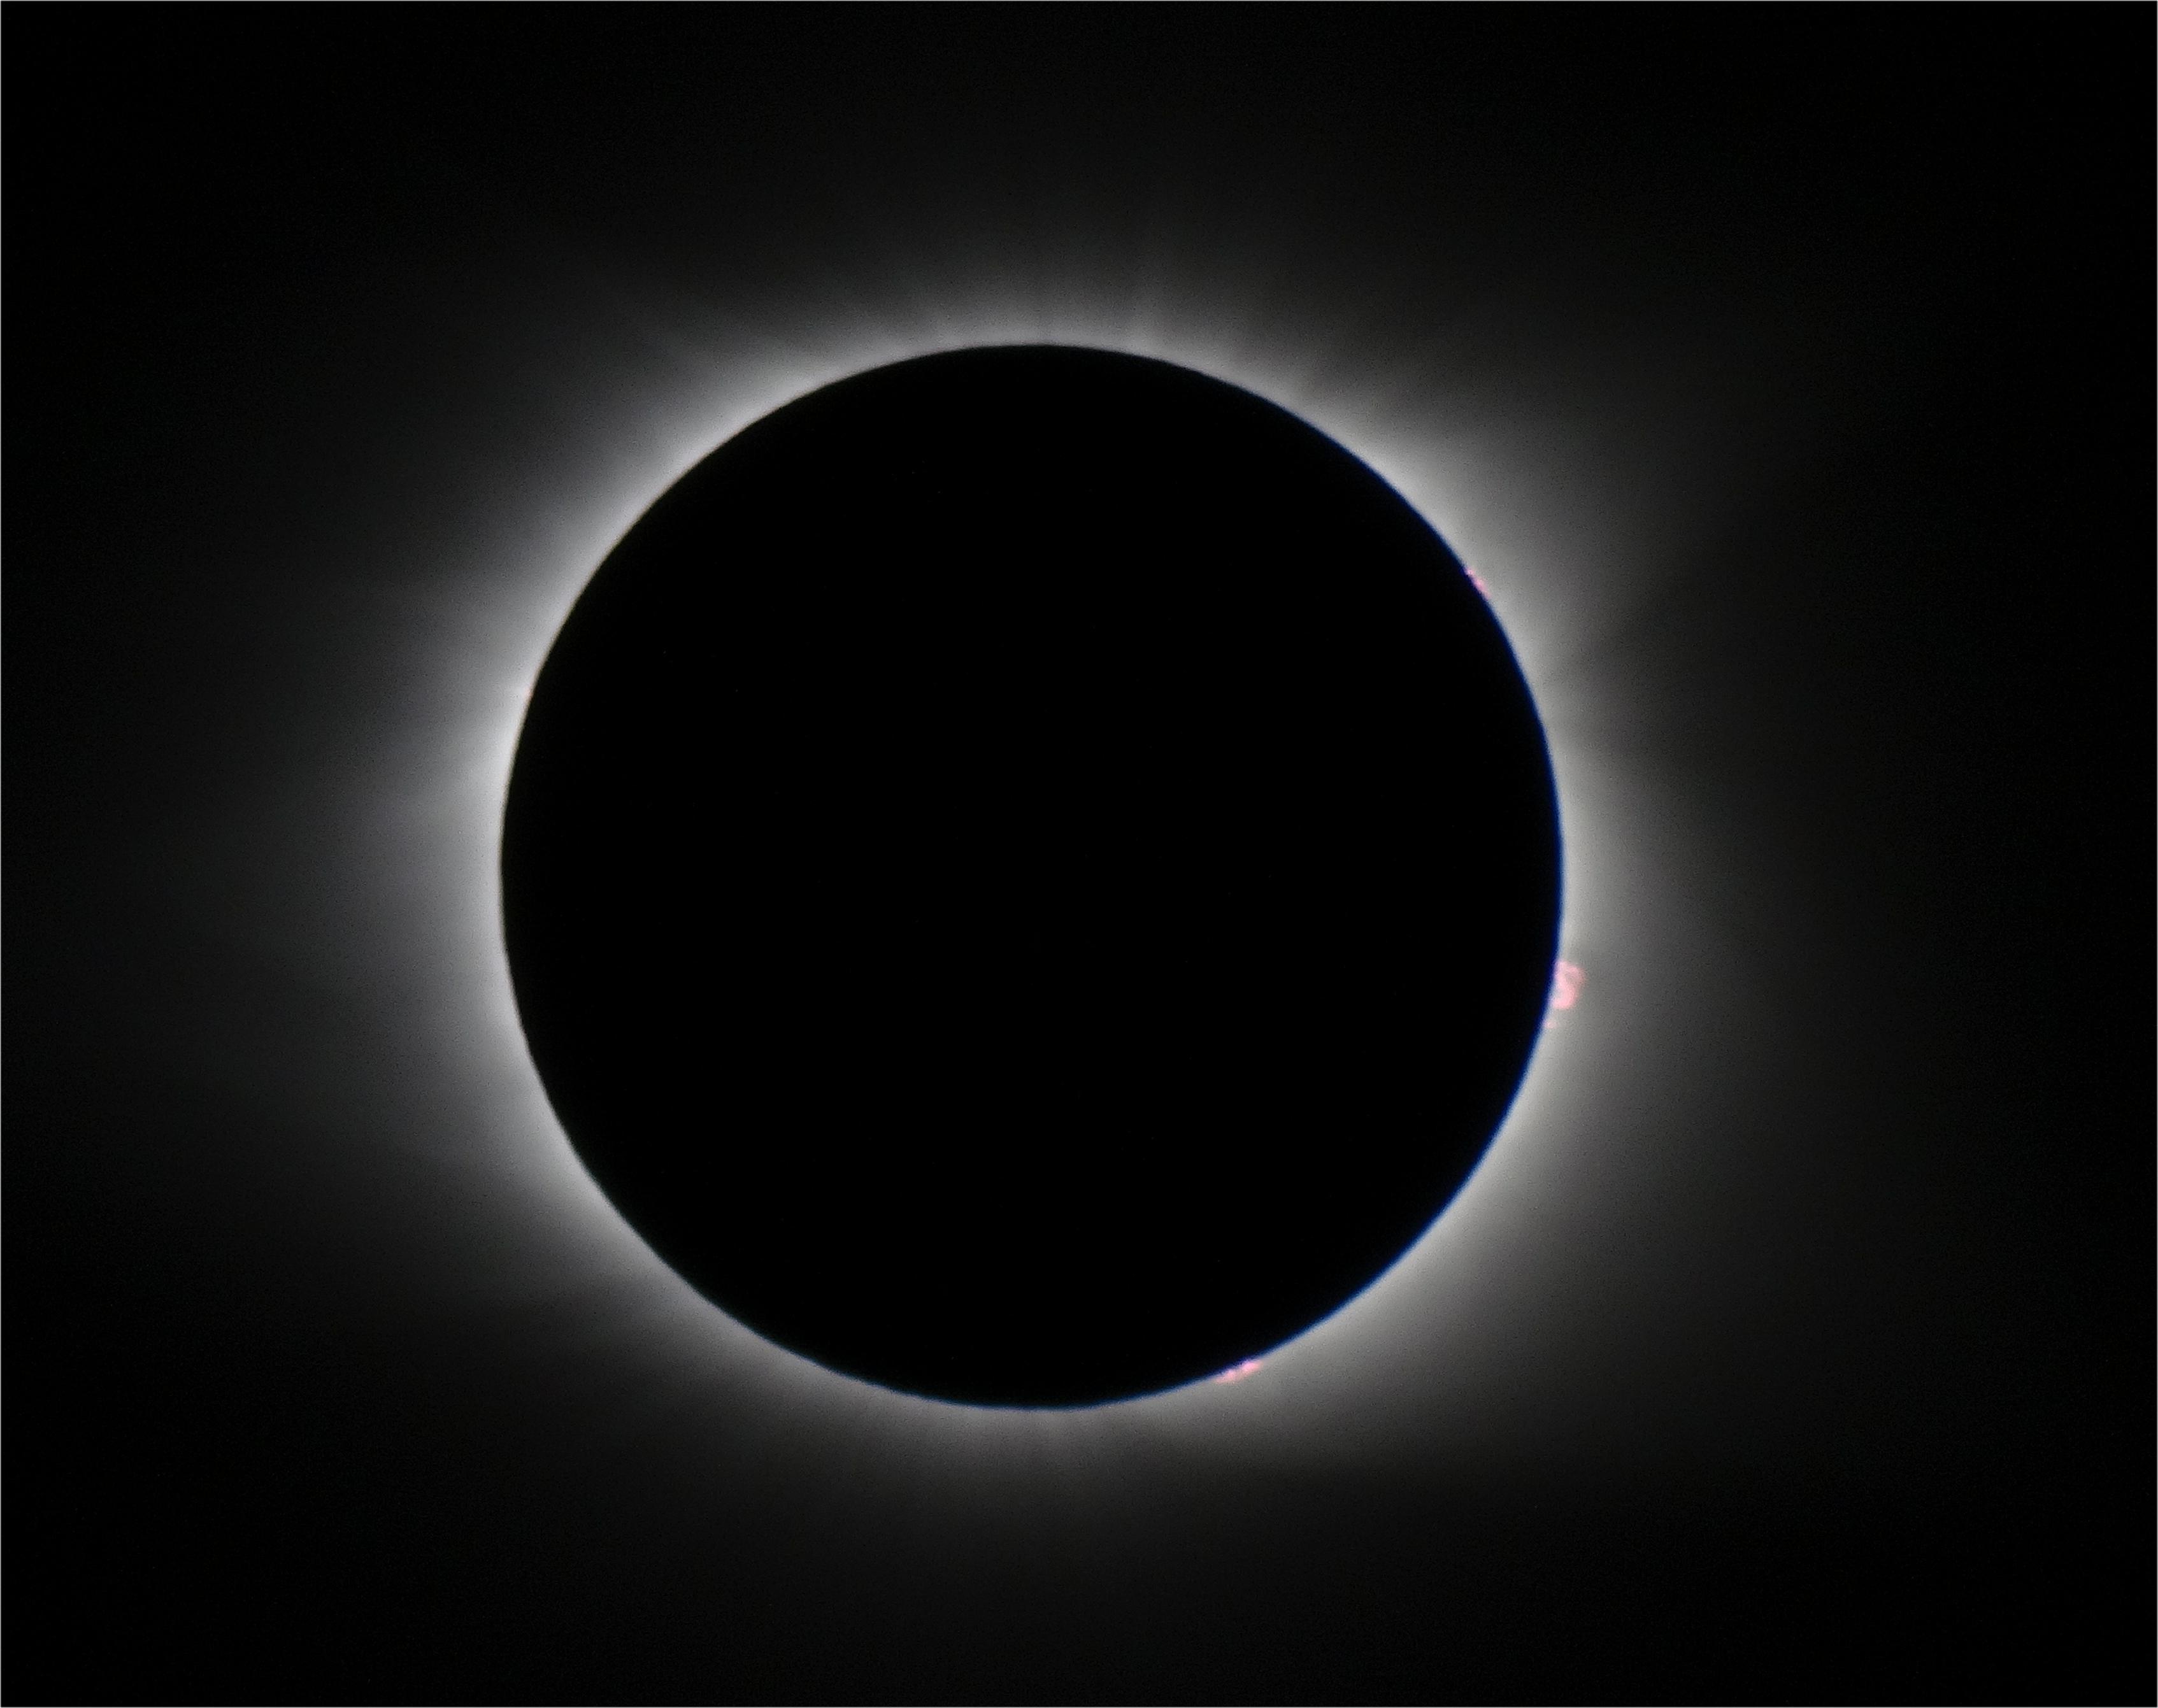 [Image: Solar%20Eclipse.JPG]